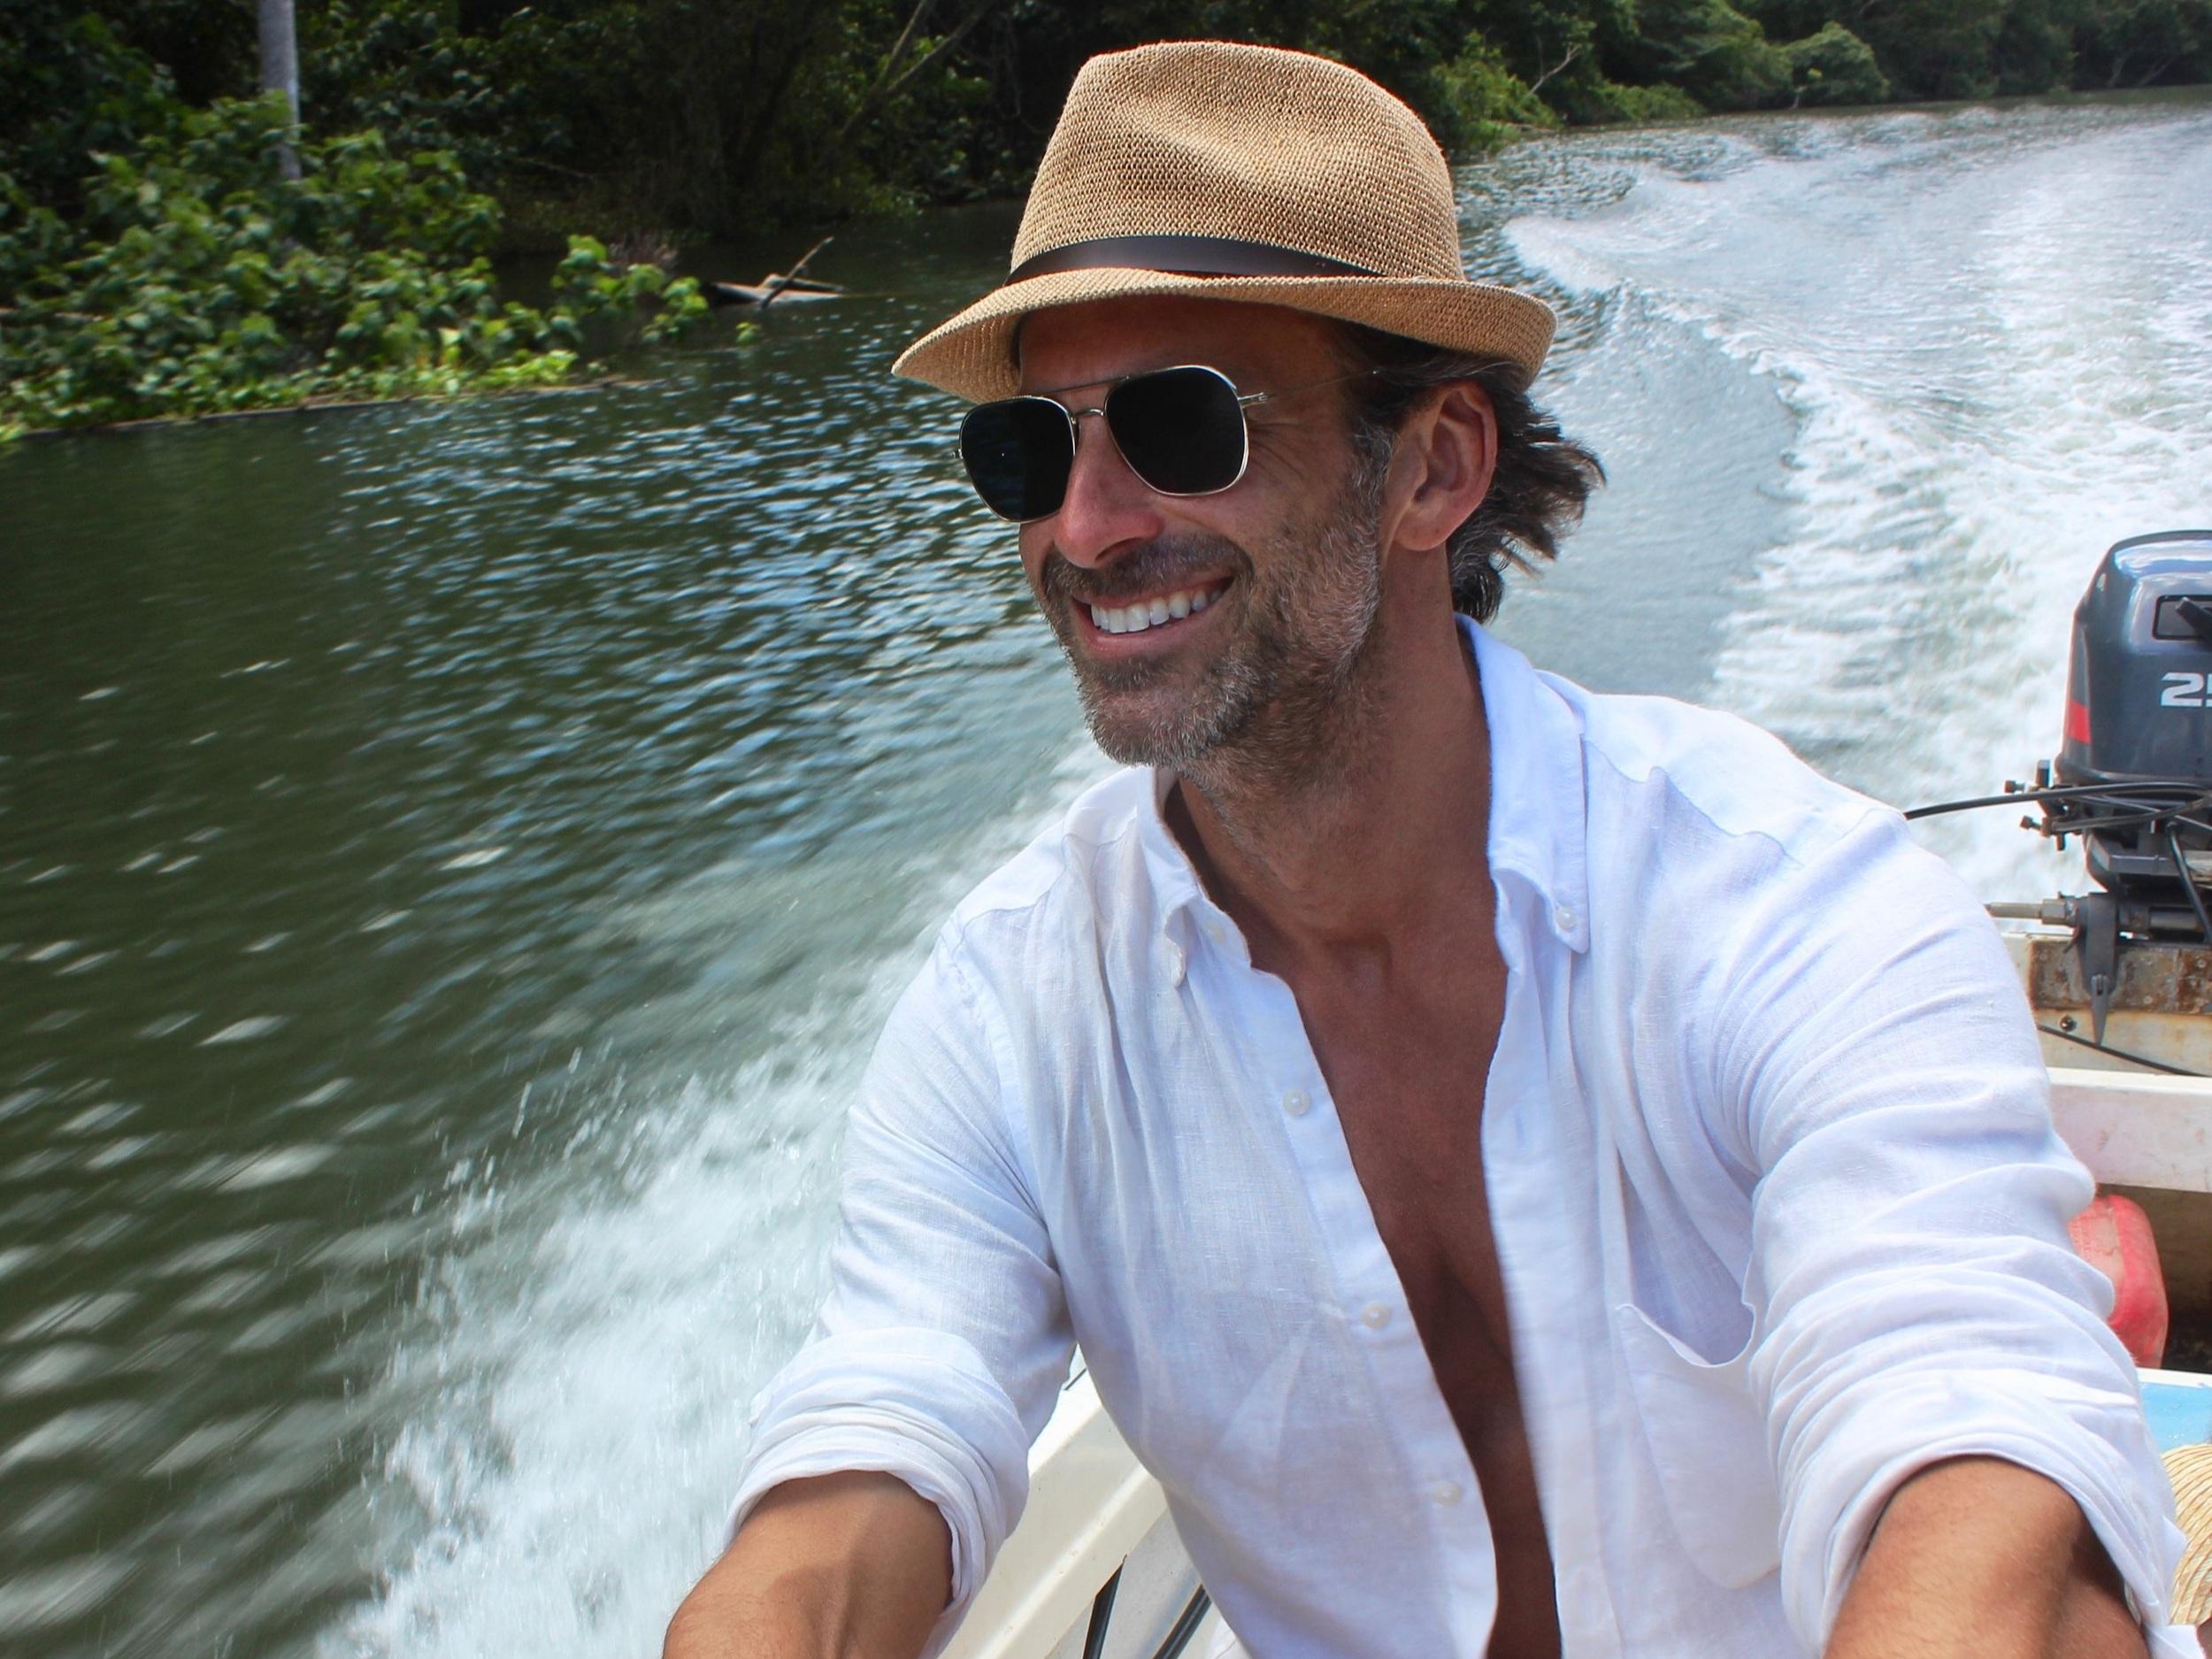 Ryan+Young+Boat+Cuba